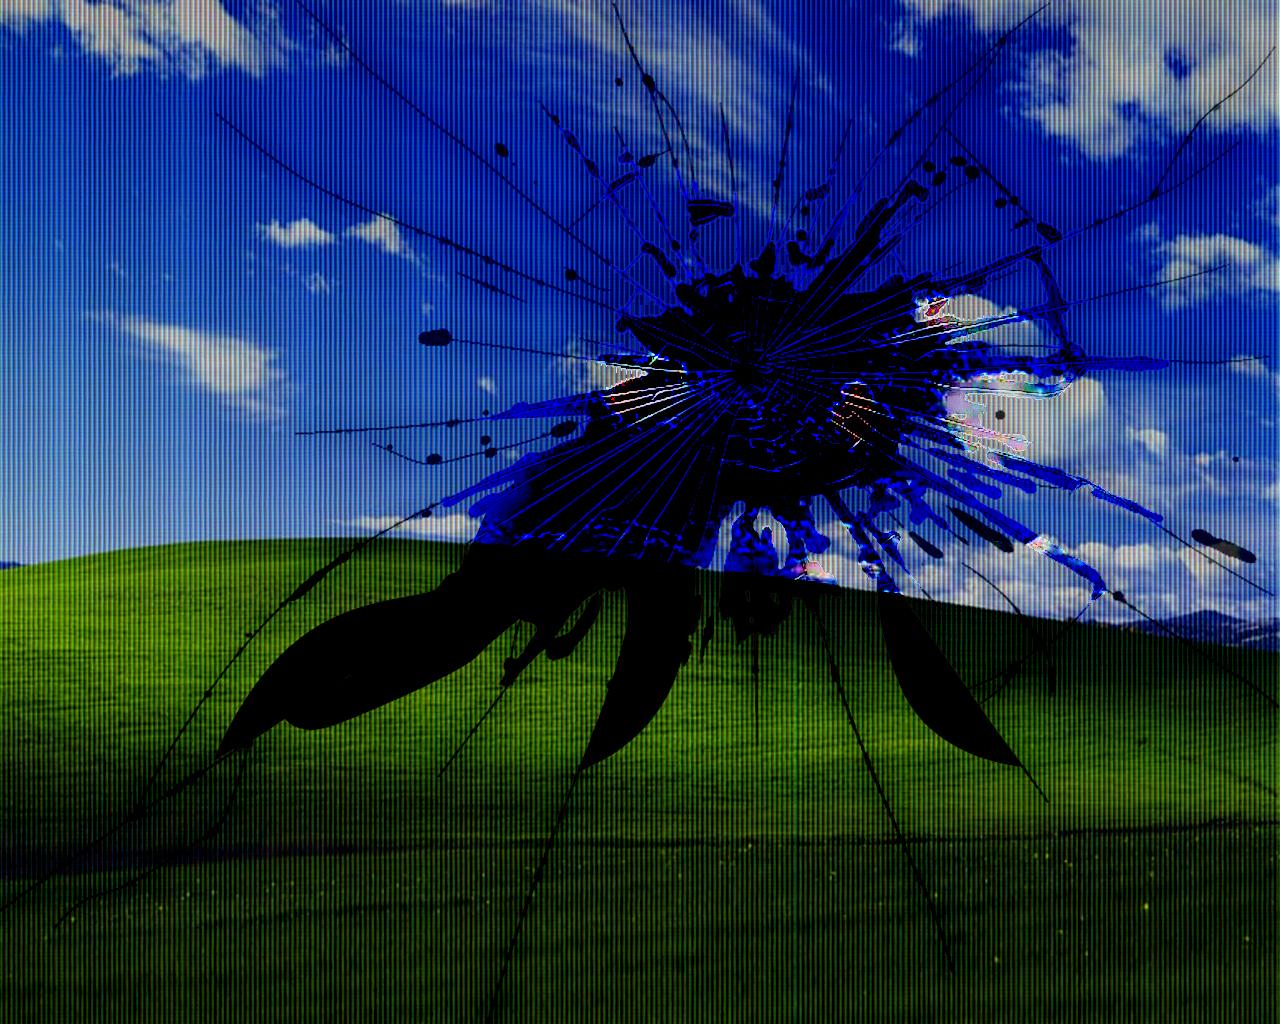 Windows XP Wallpaper 1280x1024 Windows XP Broken Screen 1280x1024